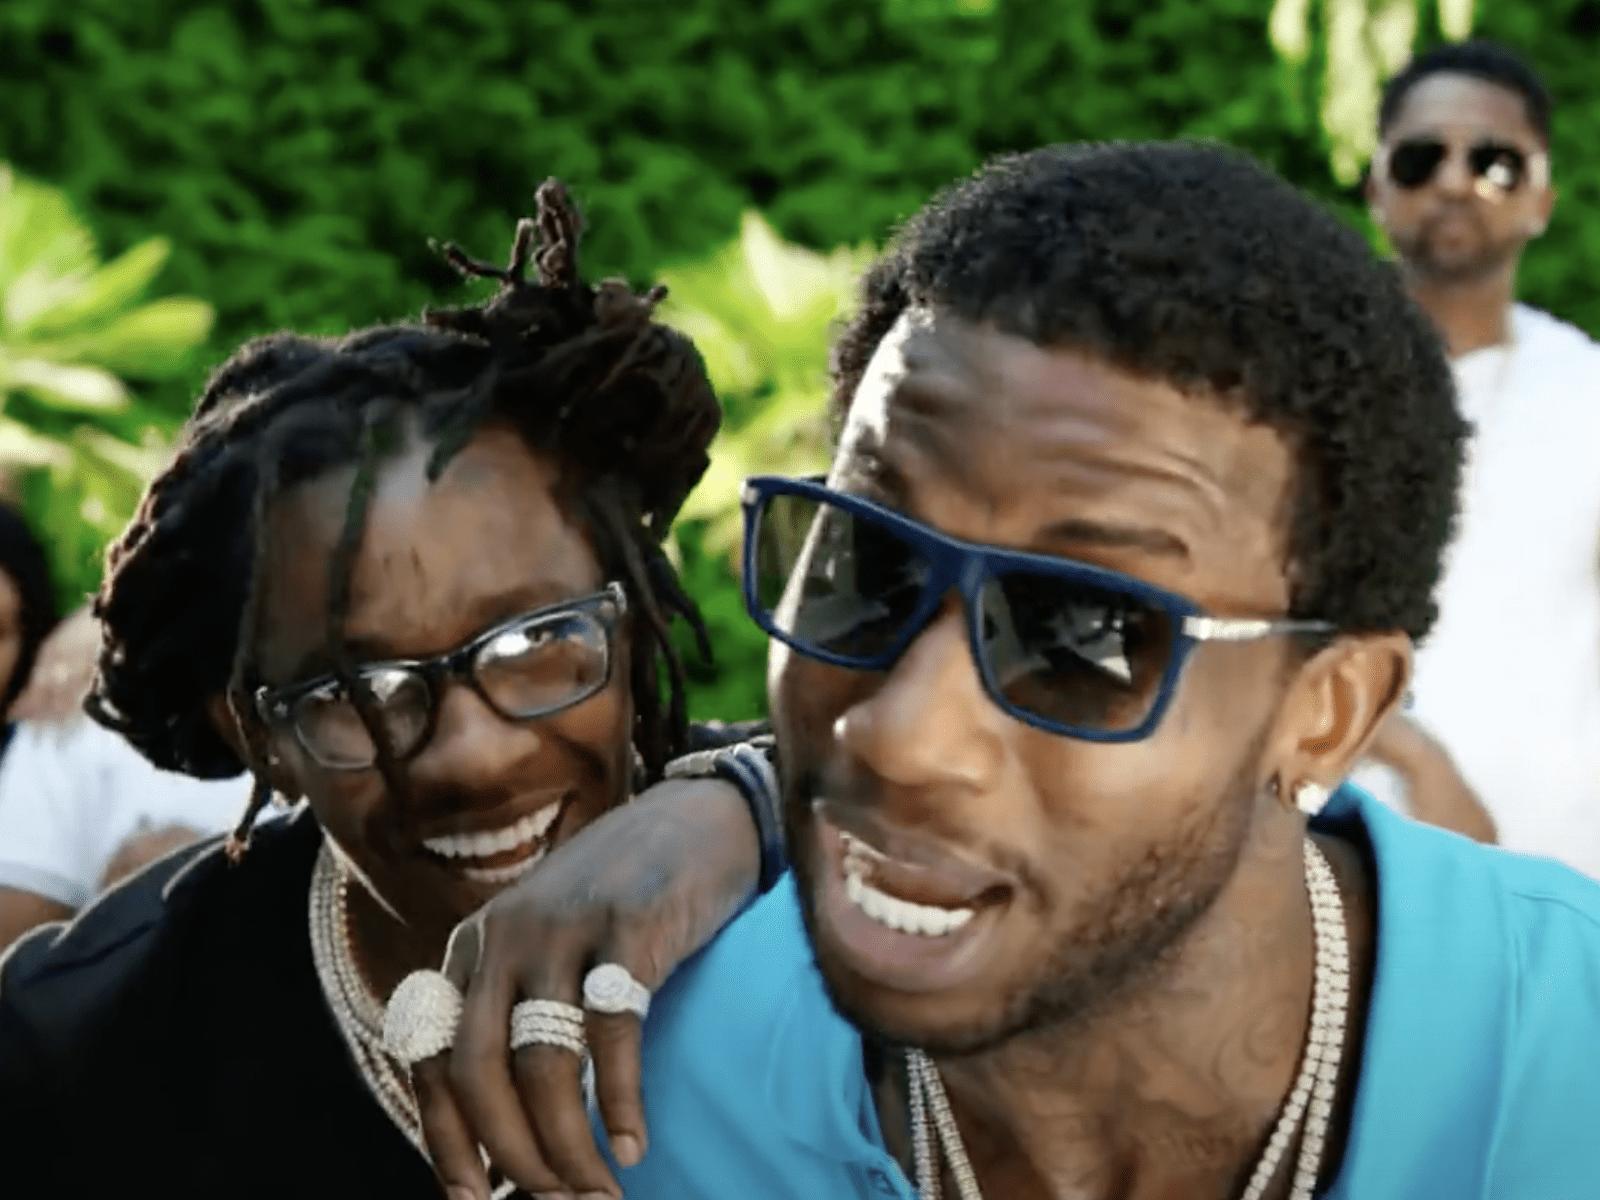 Gucci Mane Young Thug Guwop Home Music Video